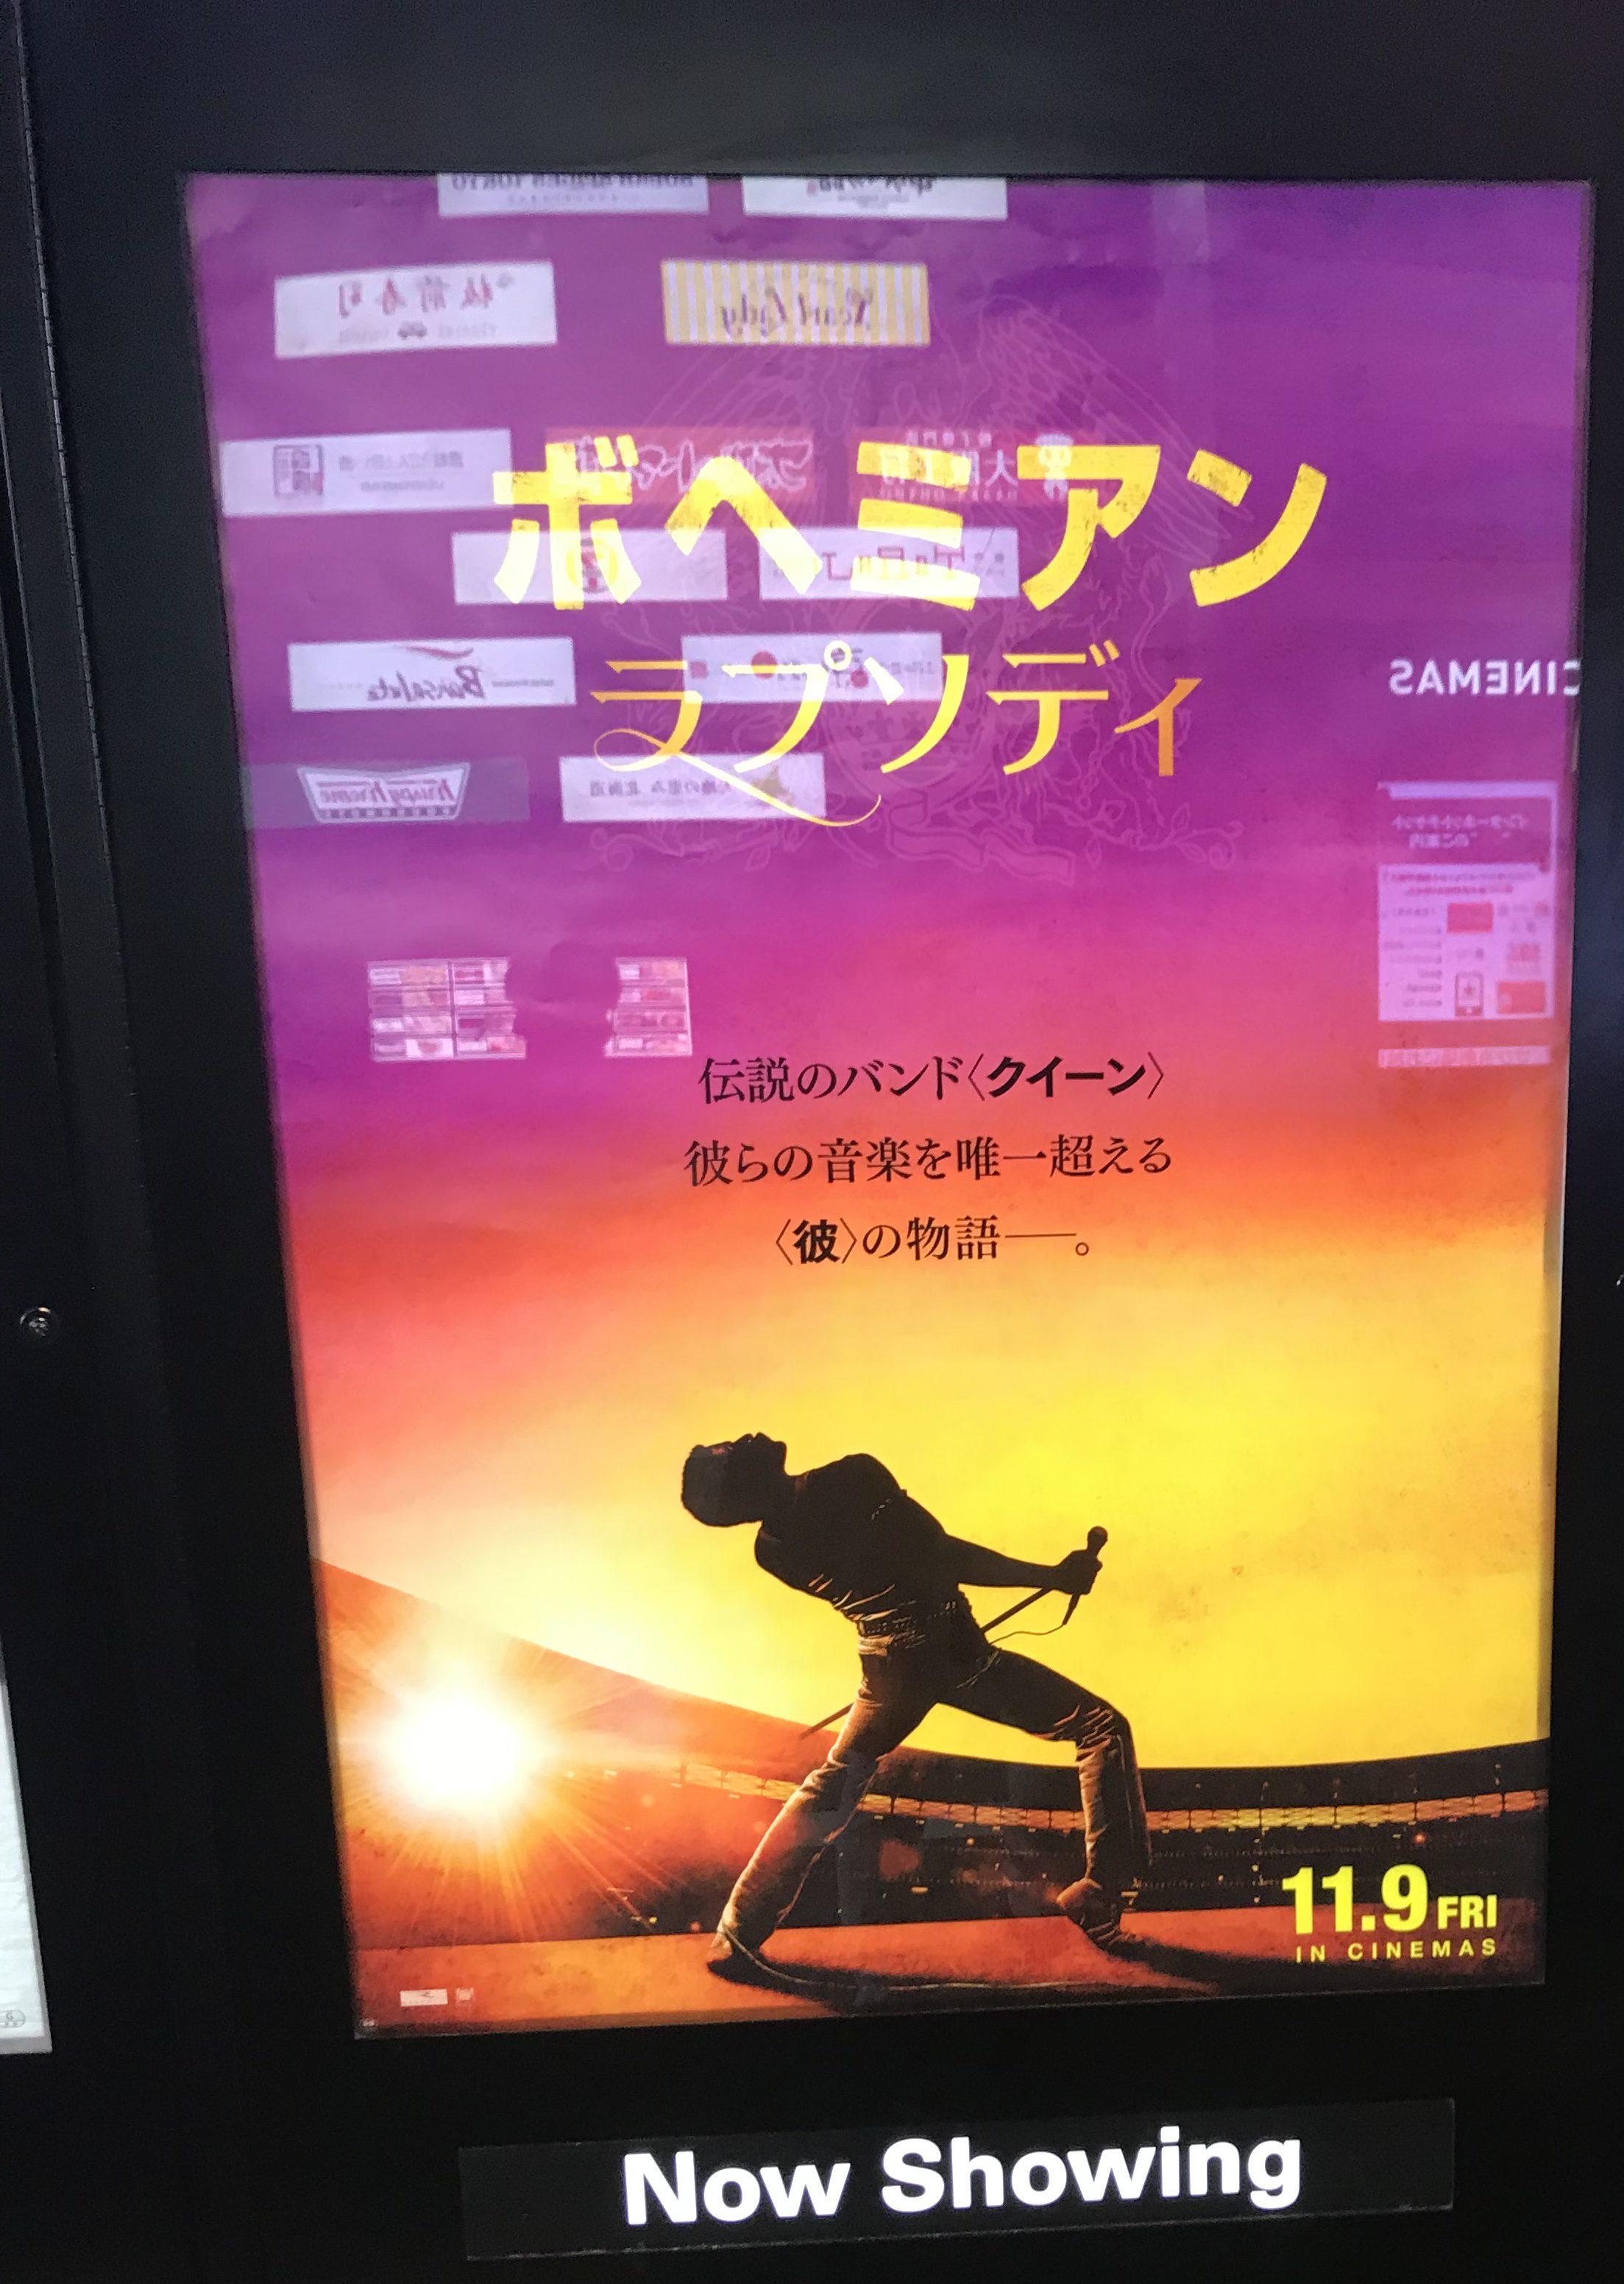 【2019】QUEEN SYMPHONIC A ROCK & ORCHESTRA EXPERIENCE クイーンのオーケストラ公演@東京国際フォーラム